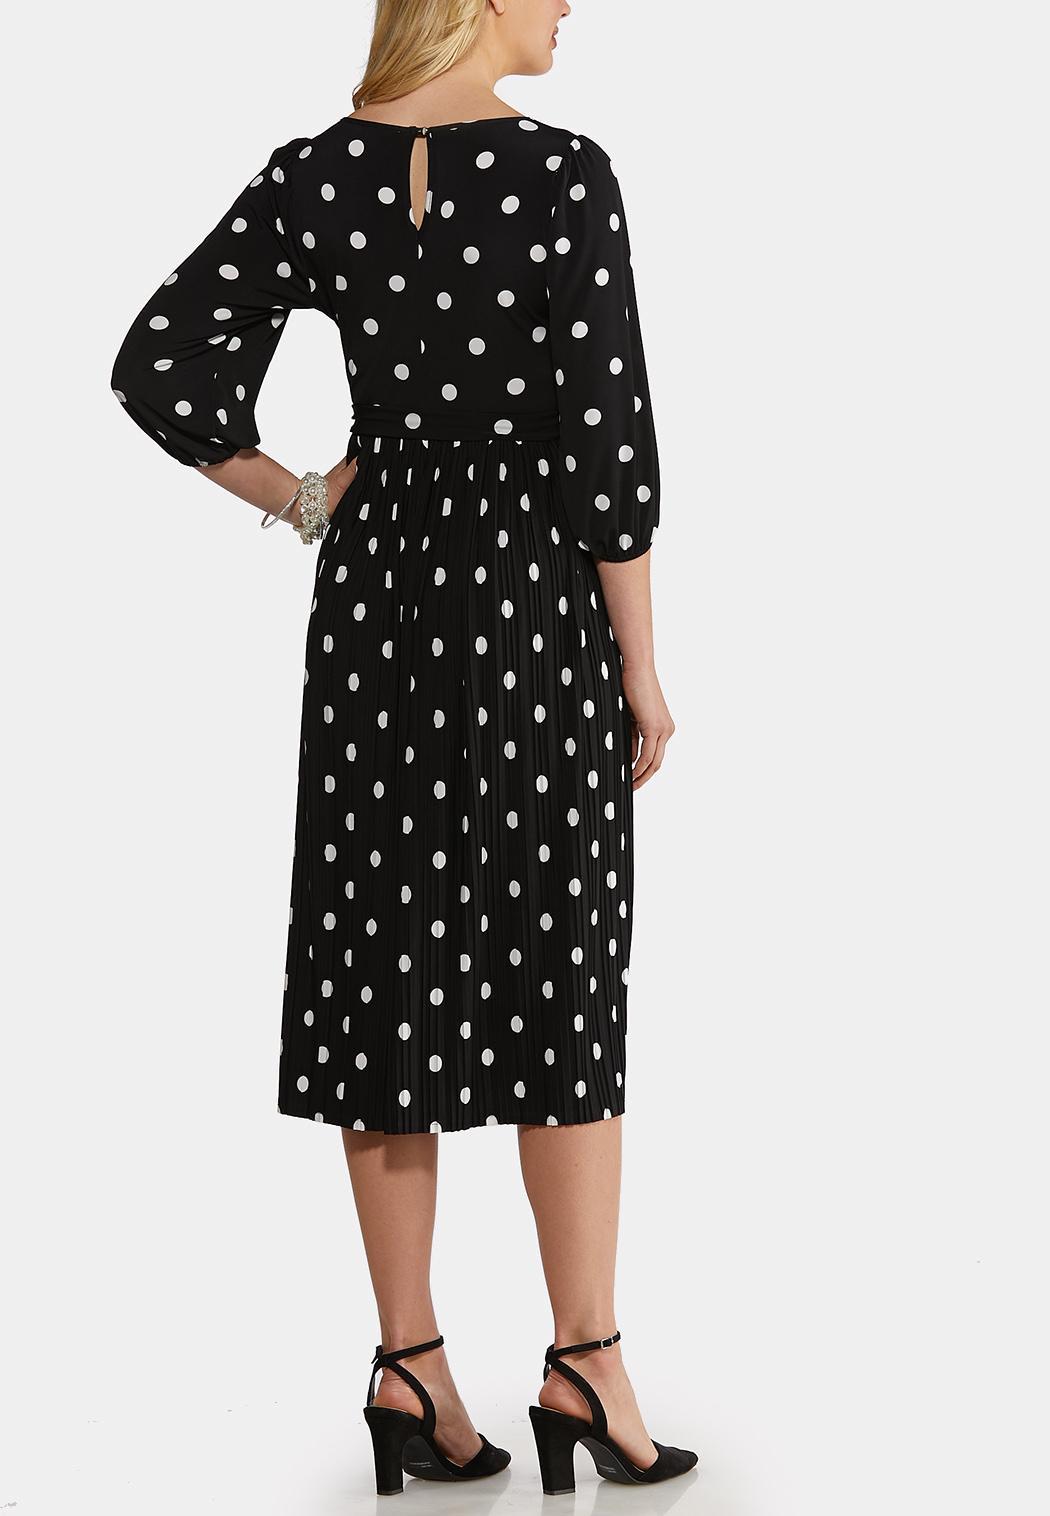 Black White Polka Dot Dress (Item #44166429)